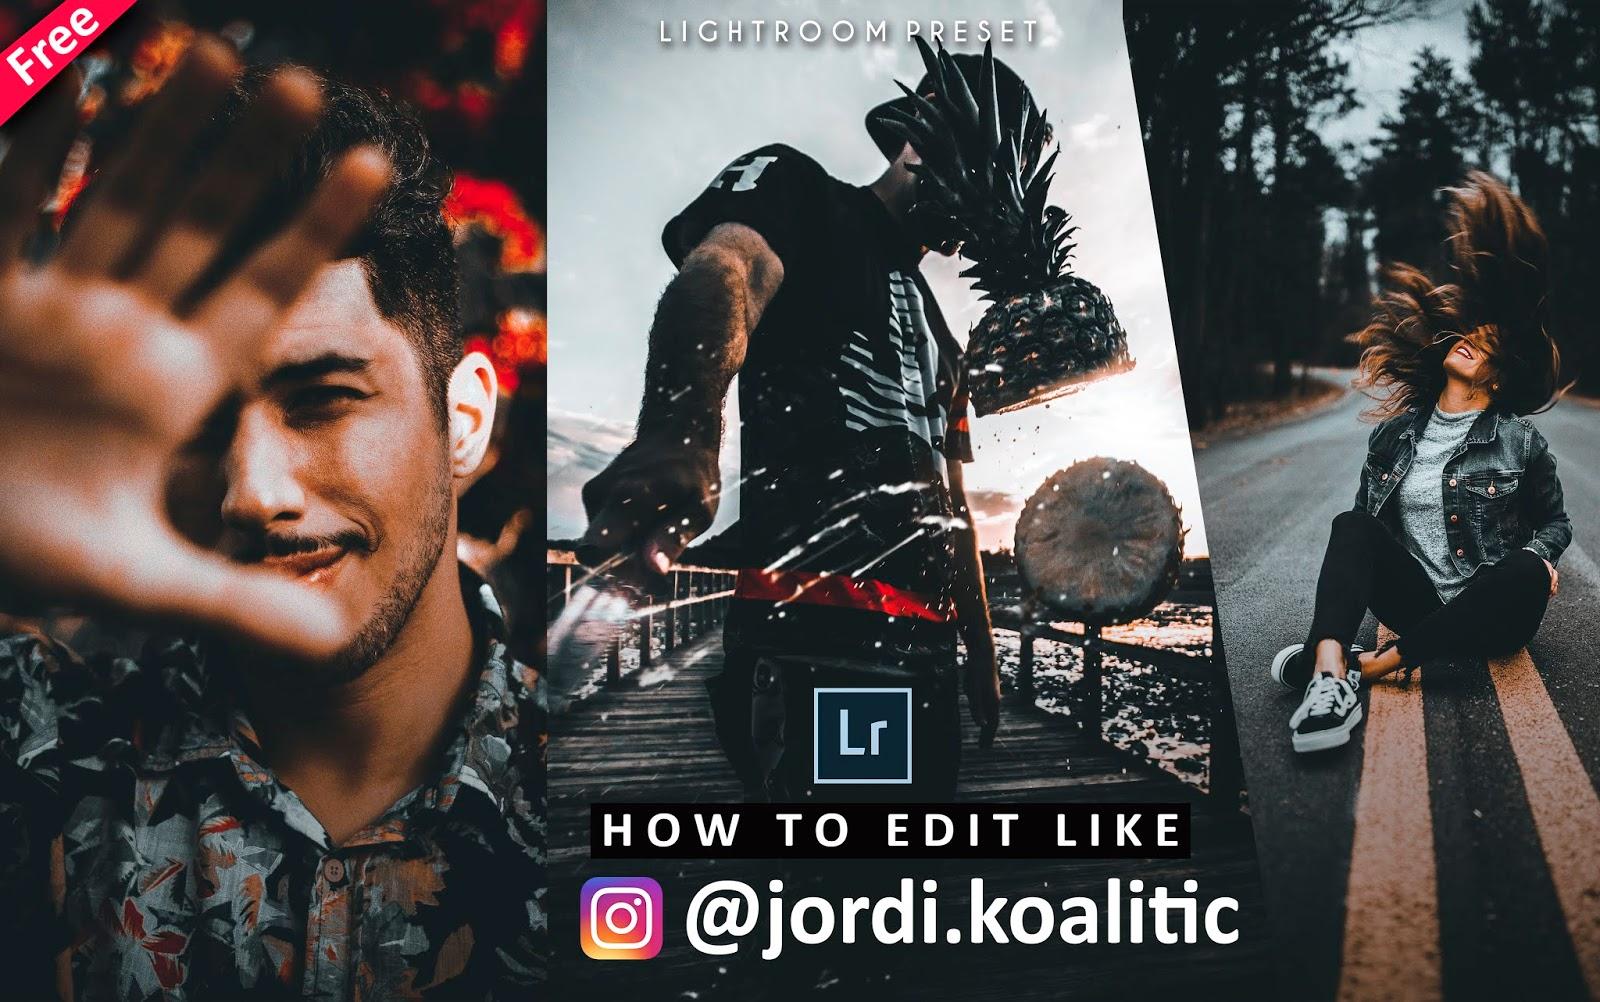 Download Jordi.Koalitic Lightroom Preset for Free | How to Edit Your Photos Like Jordi Koalitic in Lightroom